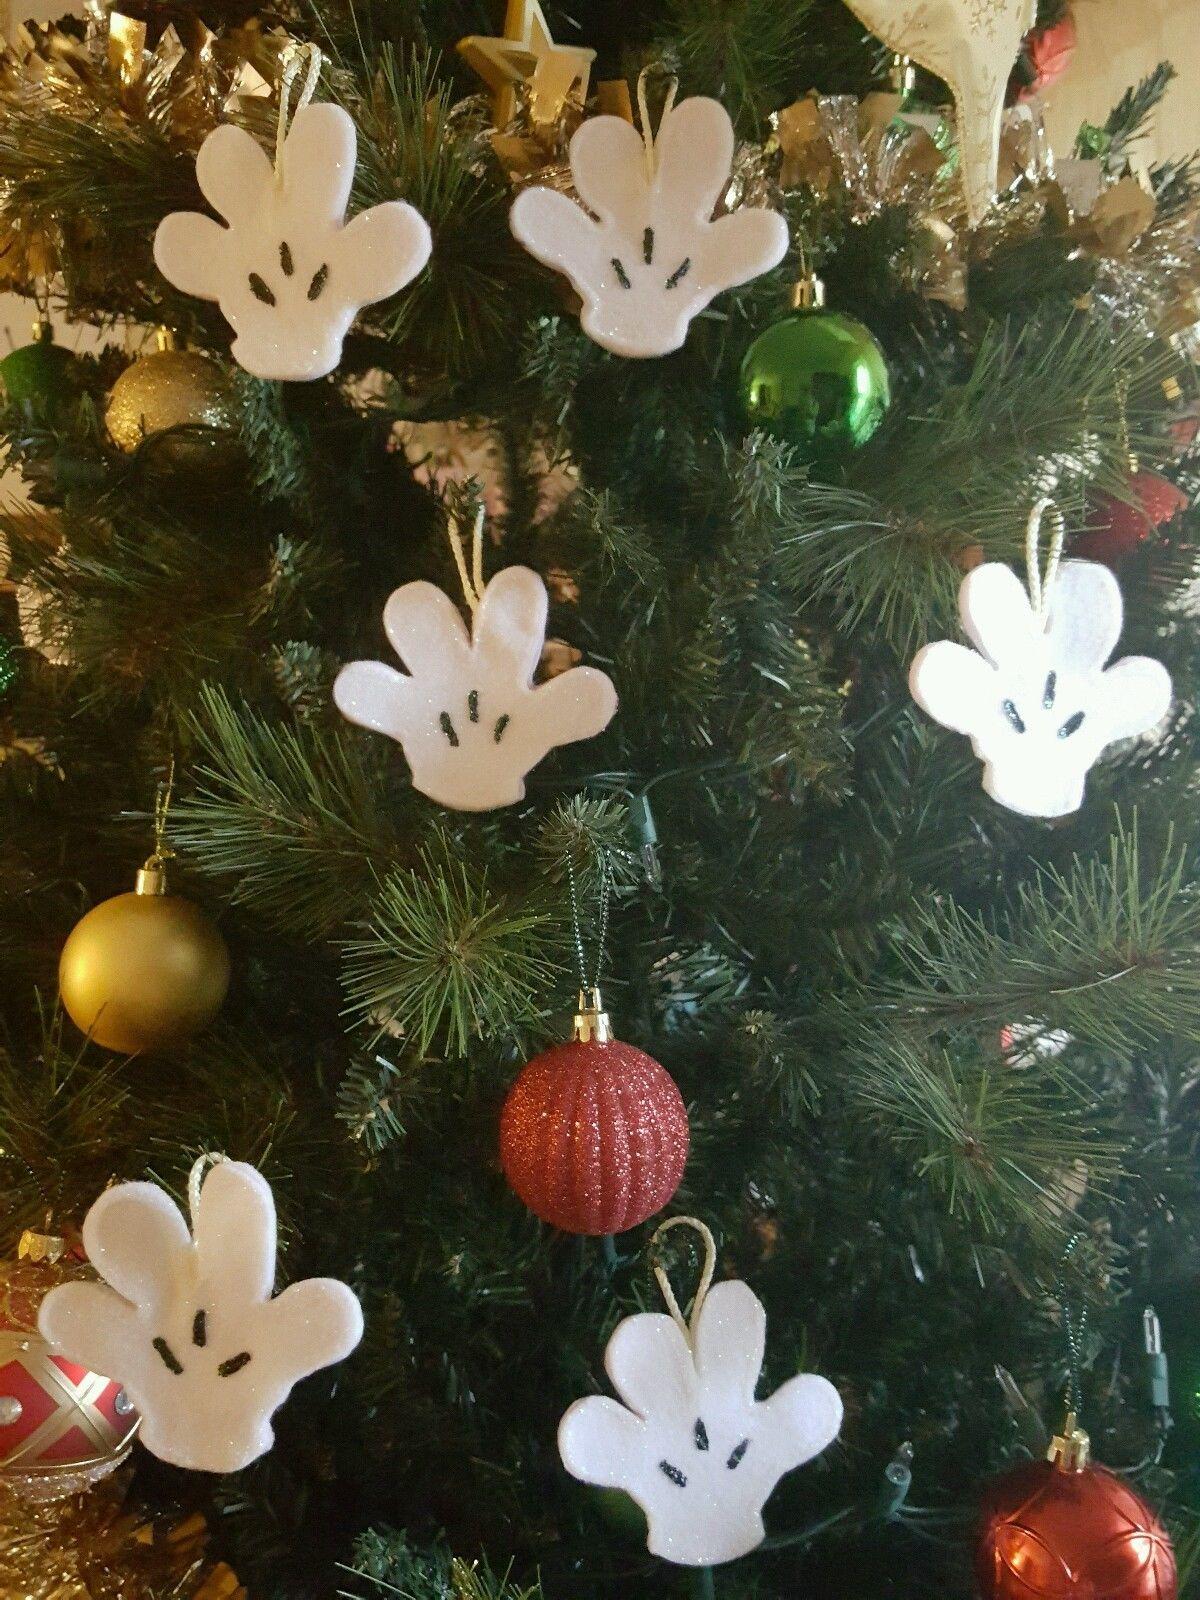 santa chair covers sets south auckland mickey mouse hands gloves christmas tree ornaments arbol navidad adorno 18 piece | todo sobre gato